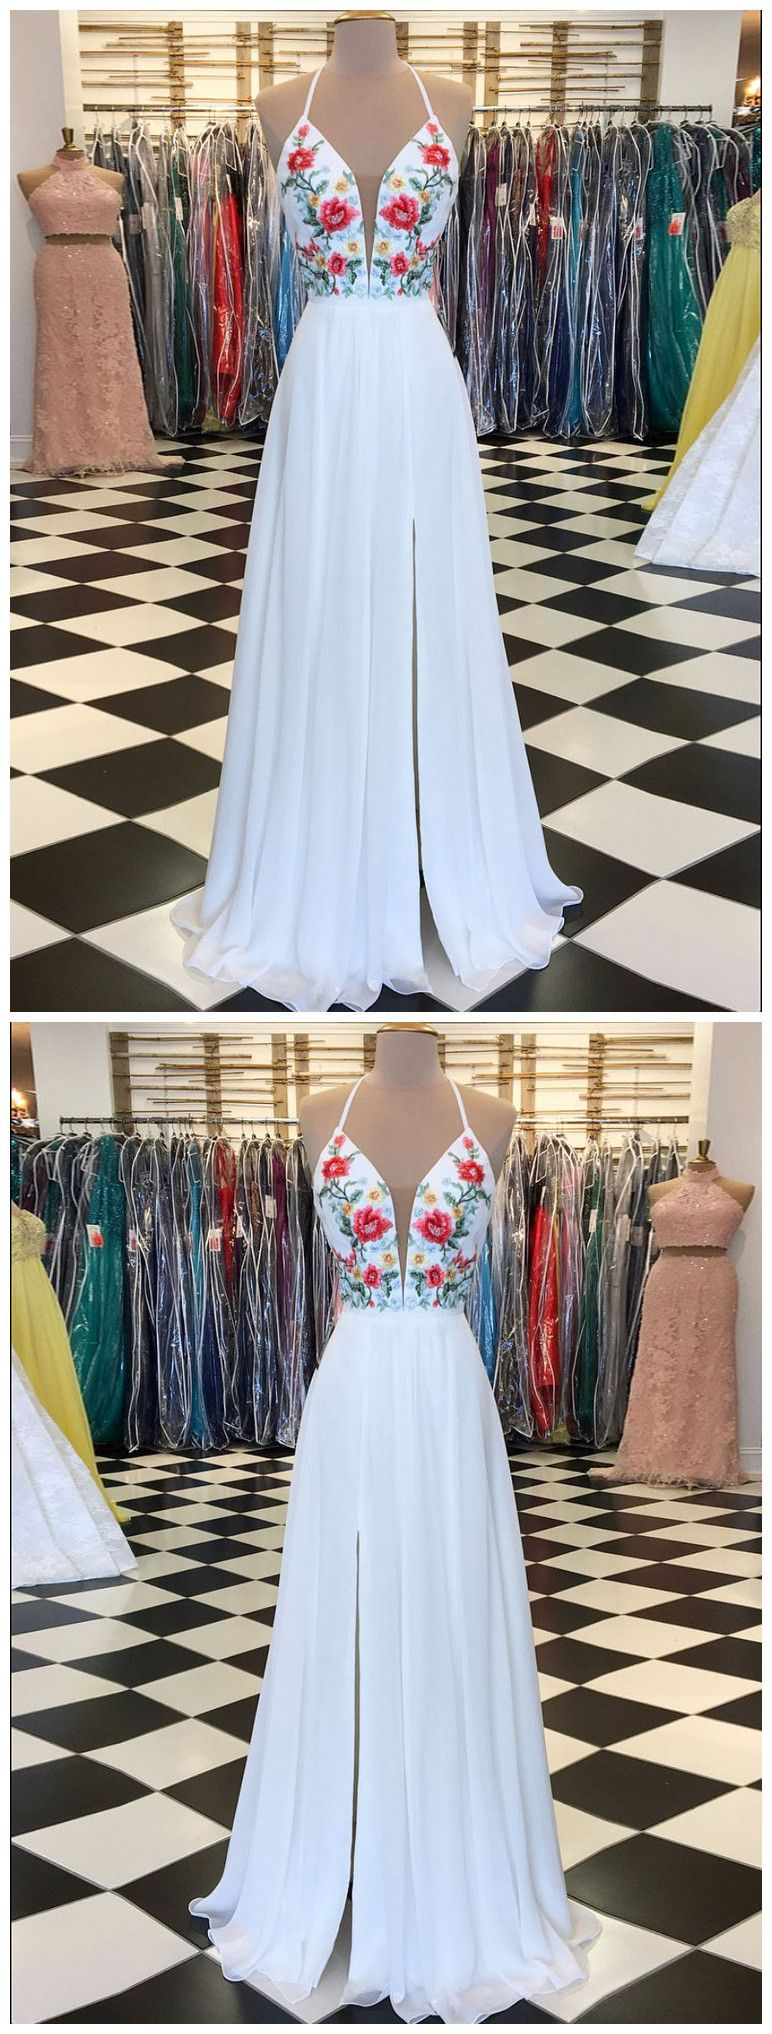 White prom dress aline floral embroidery spaghetti straps elegant